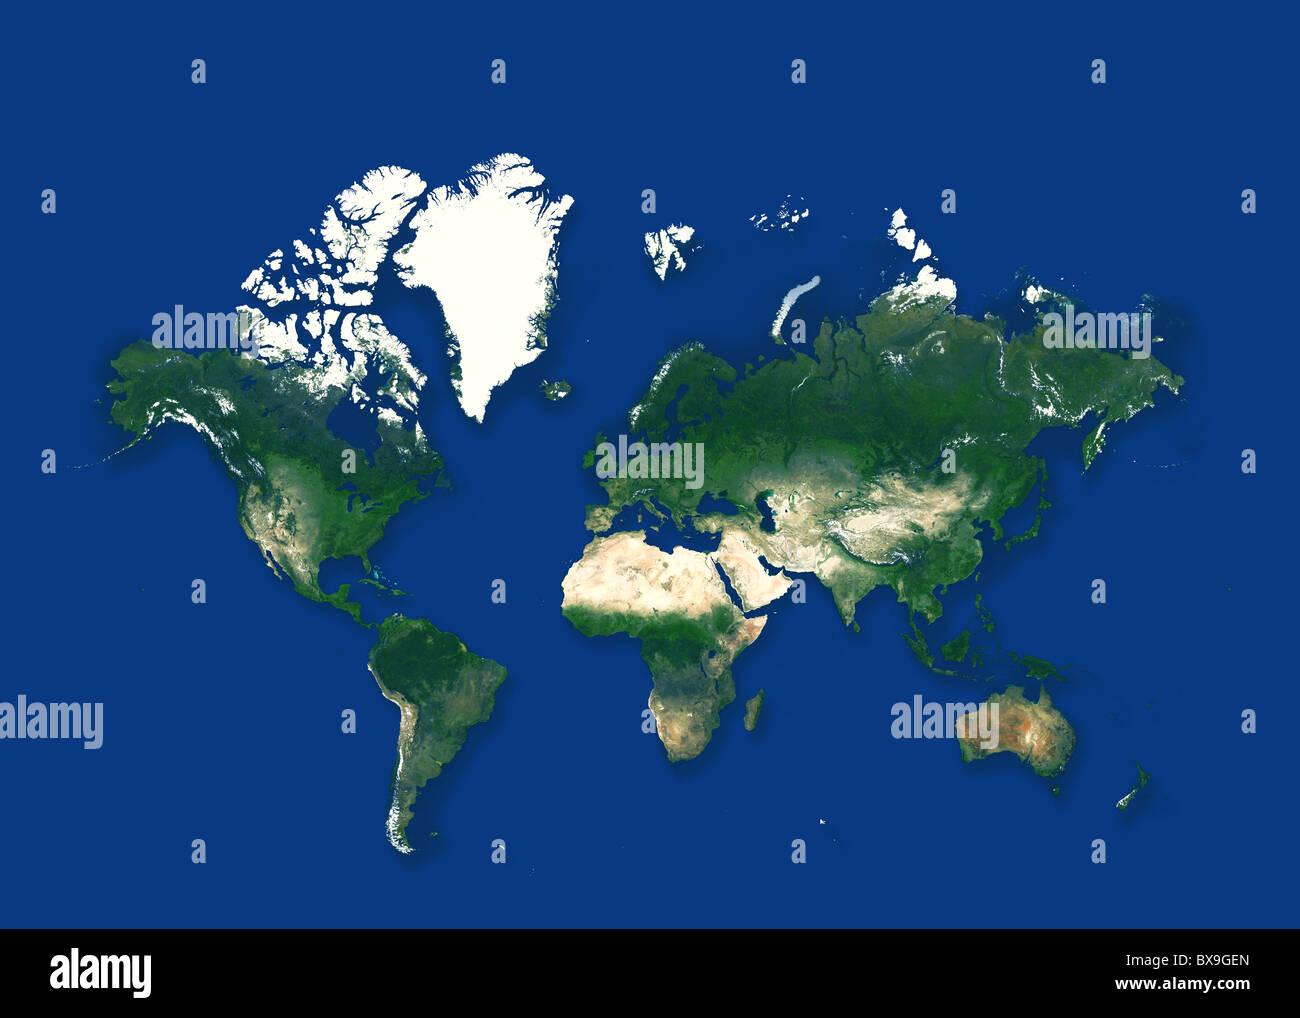 Mapa del mundo en fondo azul. Imagen De Stock